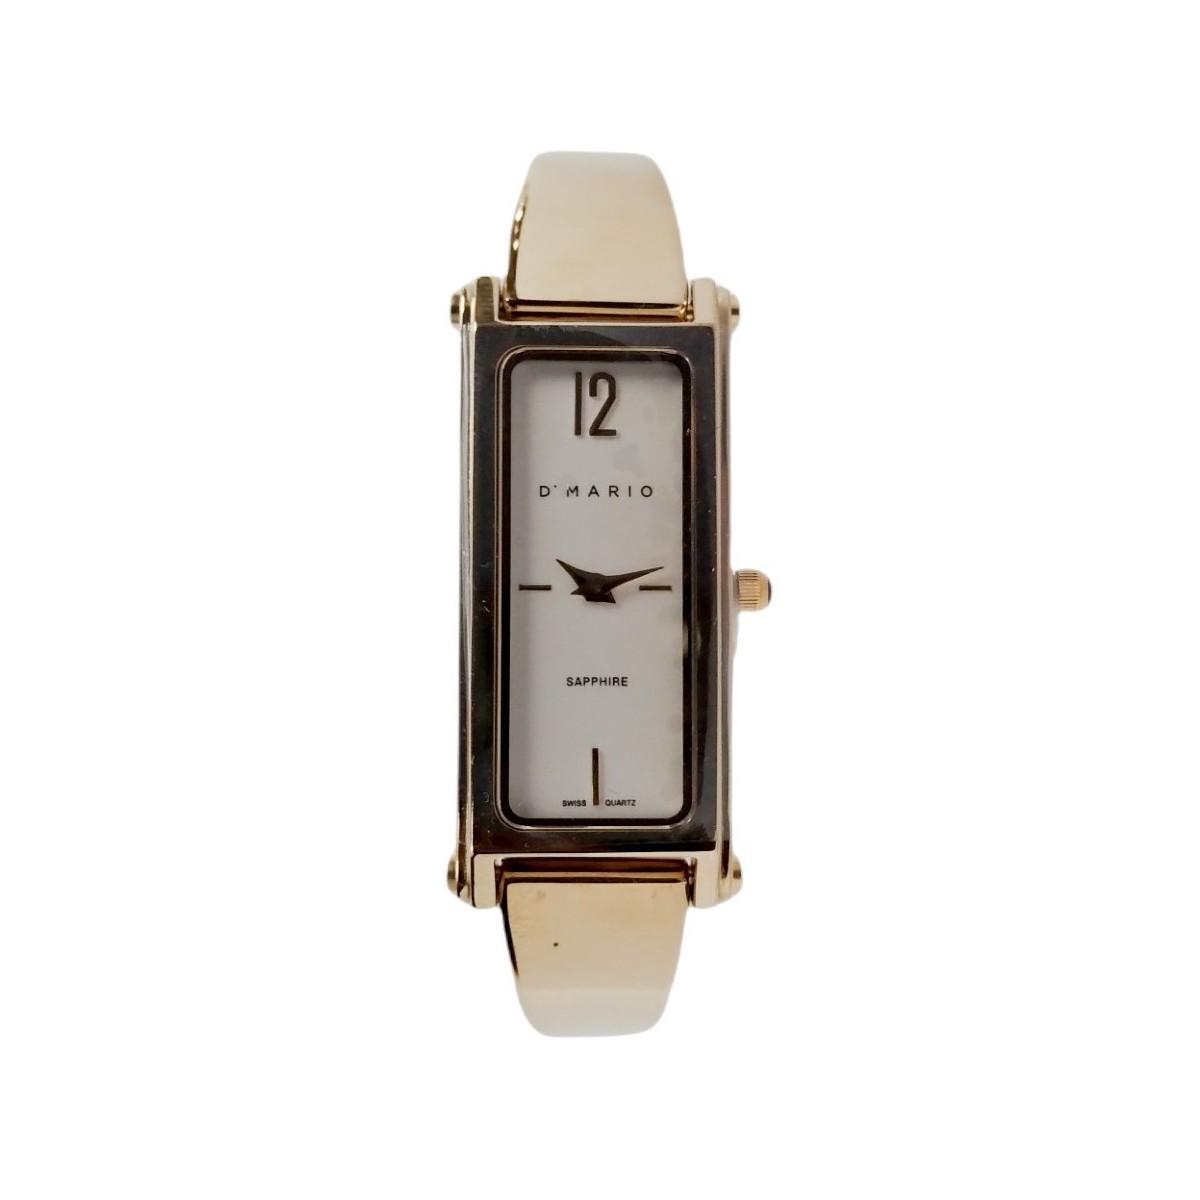 https://www.gaberjoyeria.com/6068-thickbox_default/reloj-dmario-.jpg